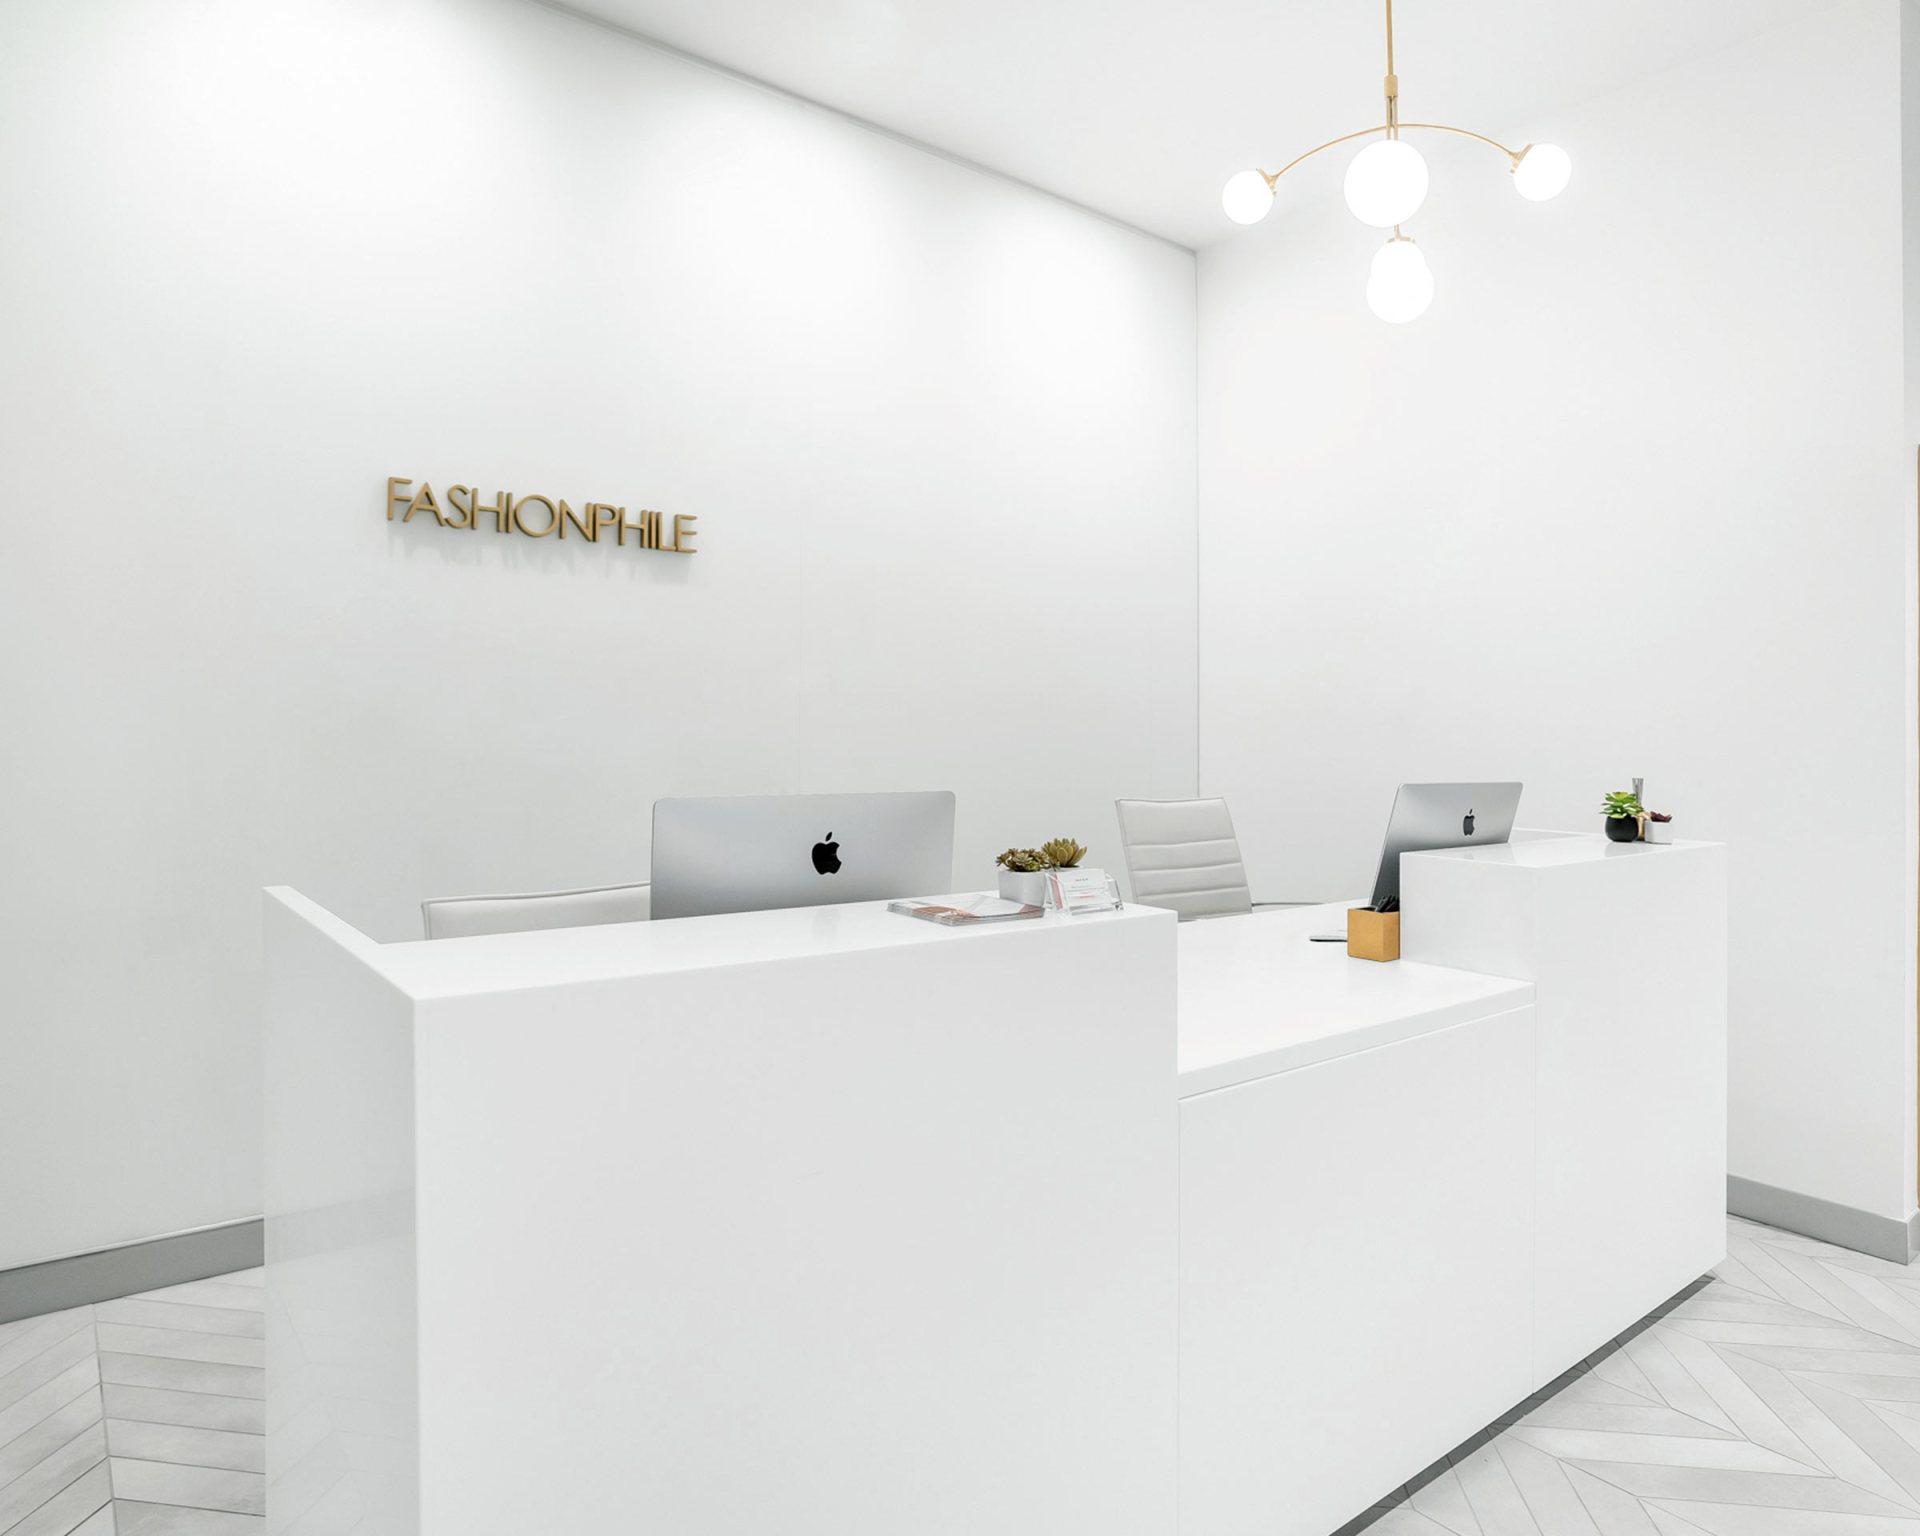 Photo of Fashionphile Selling Studio at Neiman Marcus